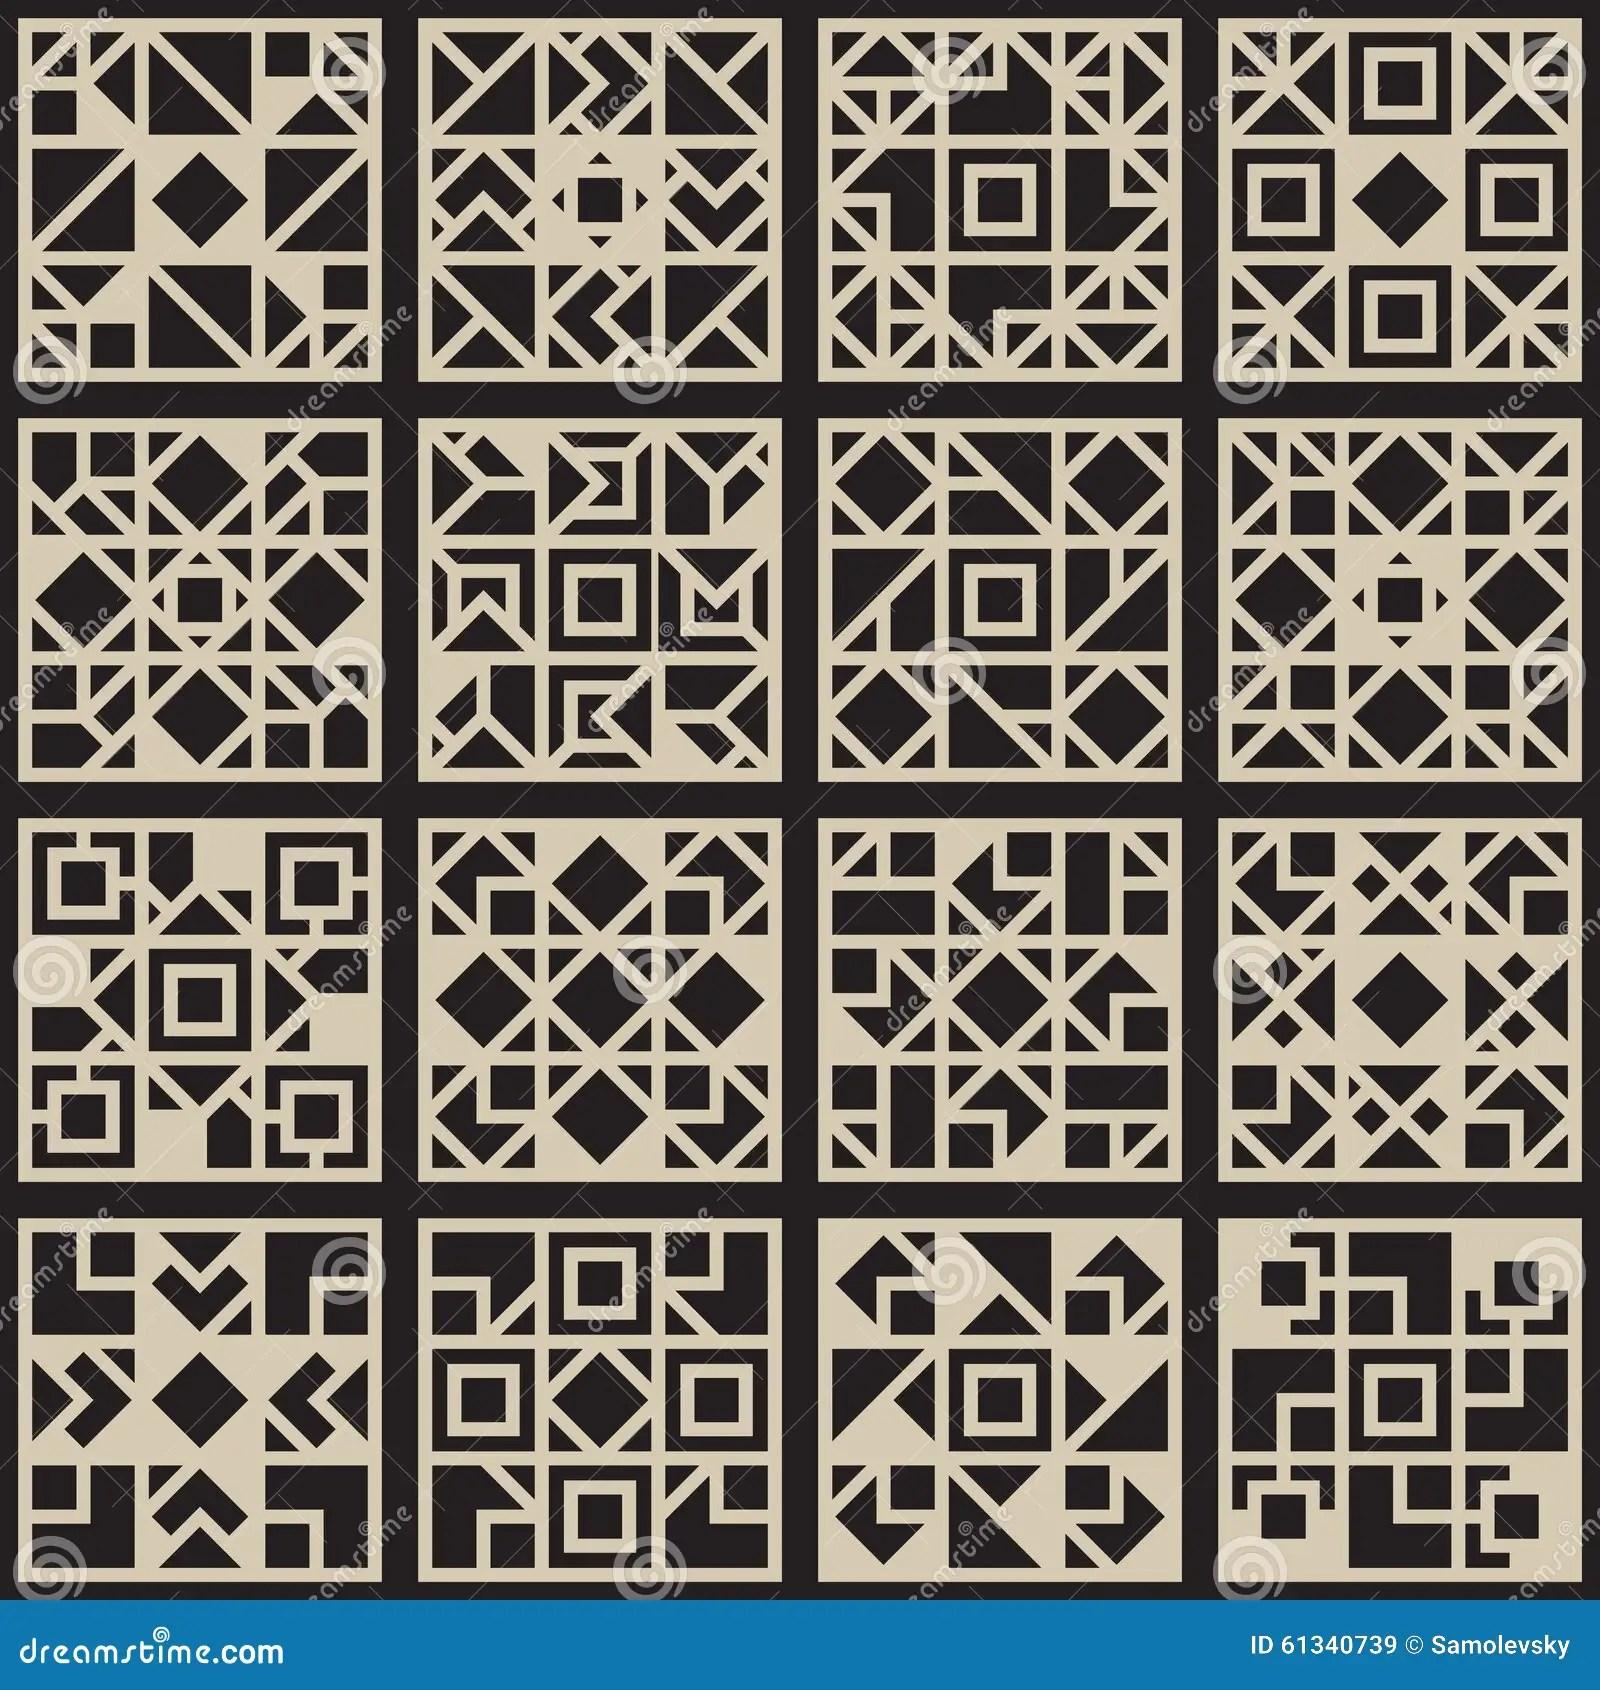 Vector Black Amp White Seamless Geometric Square Grid